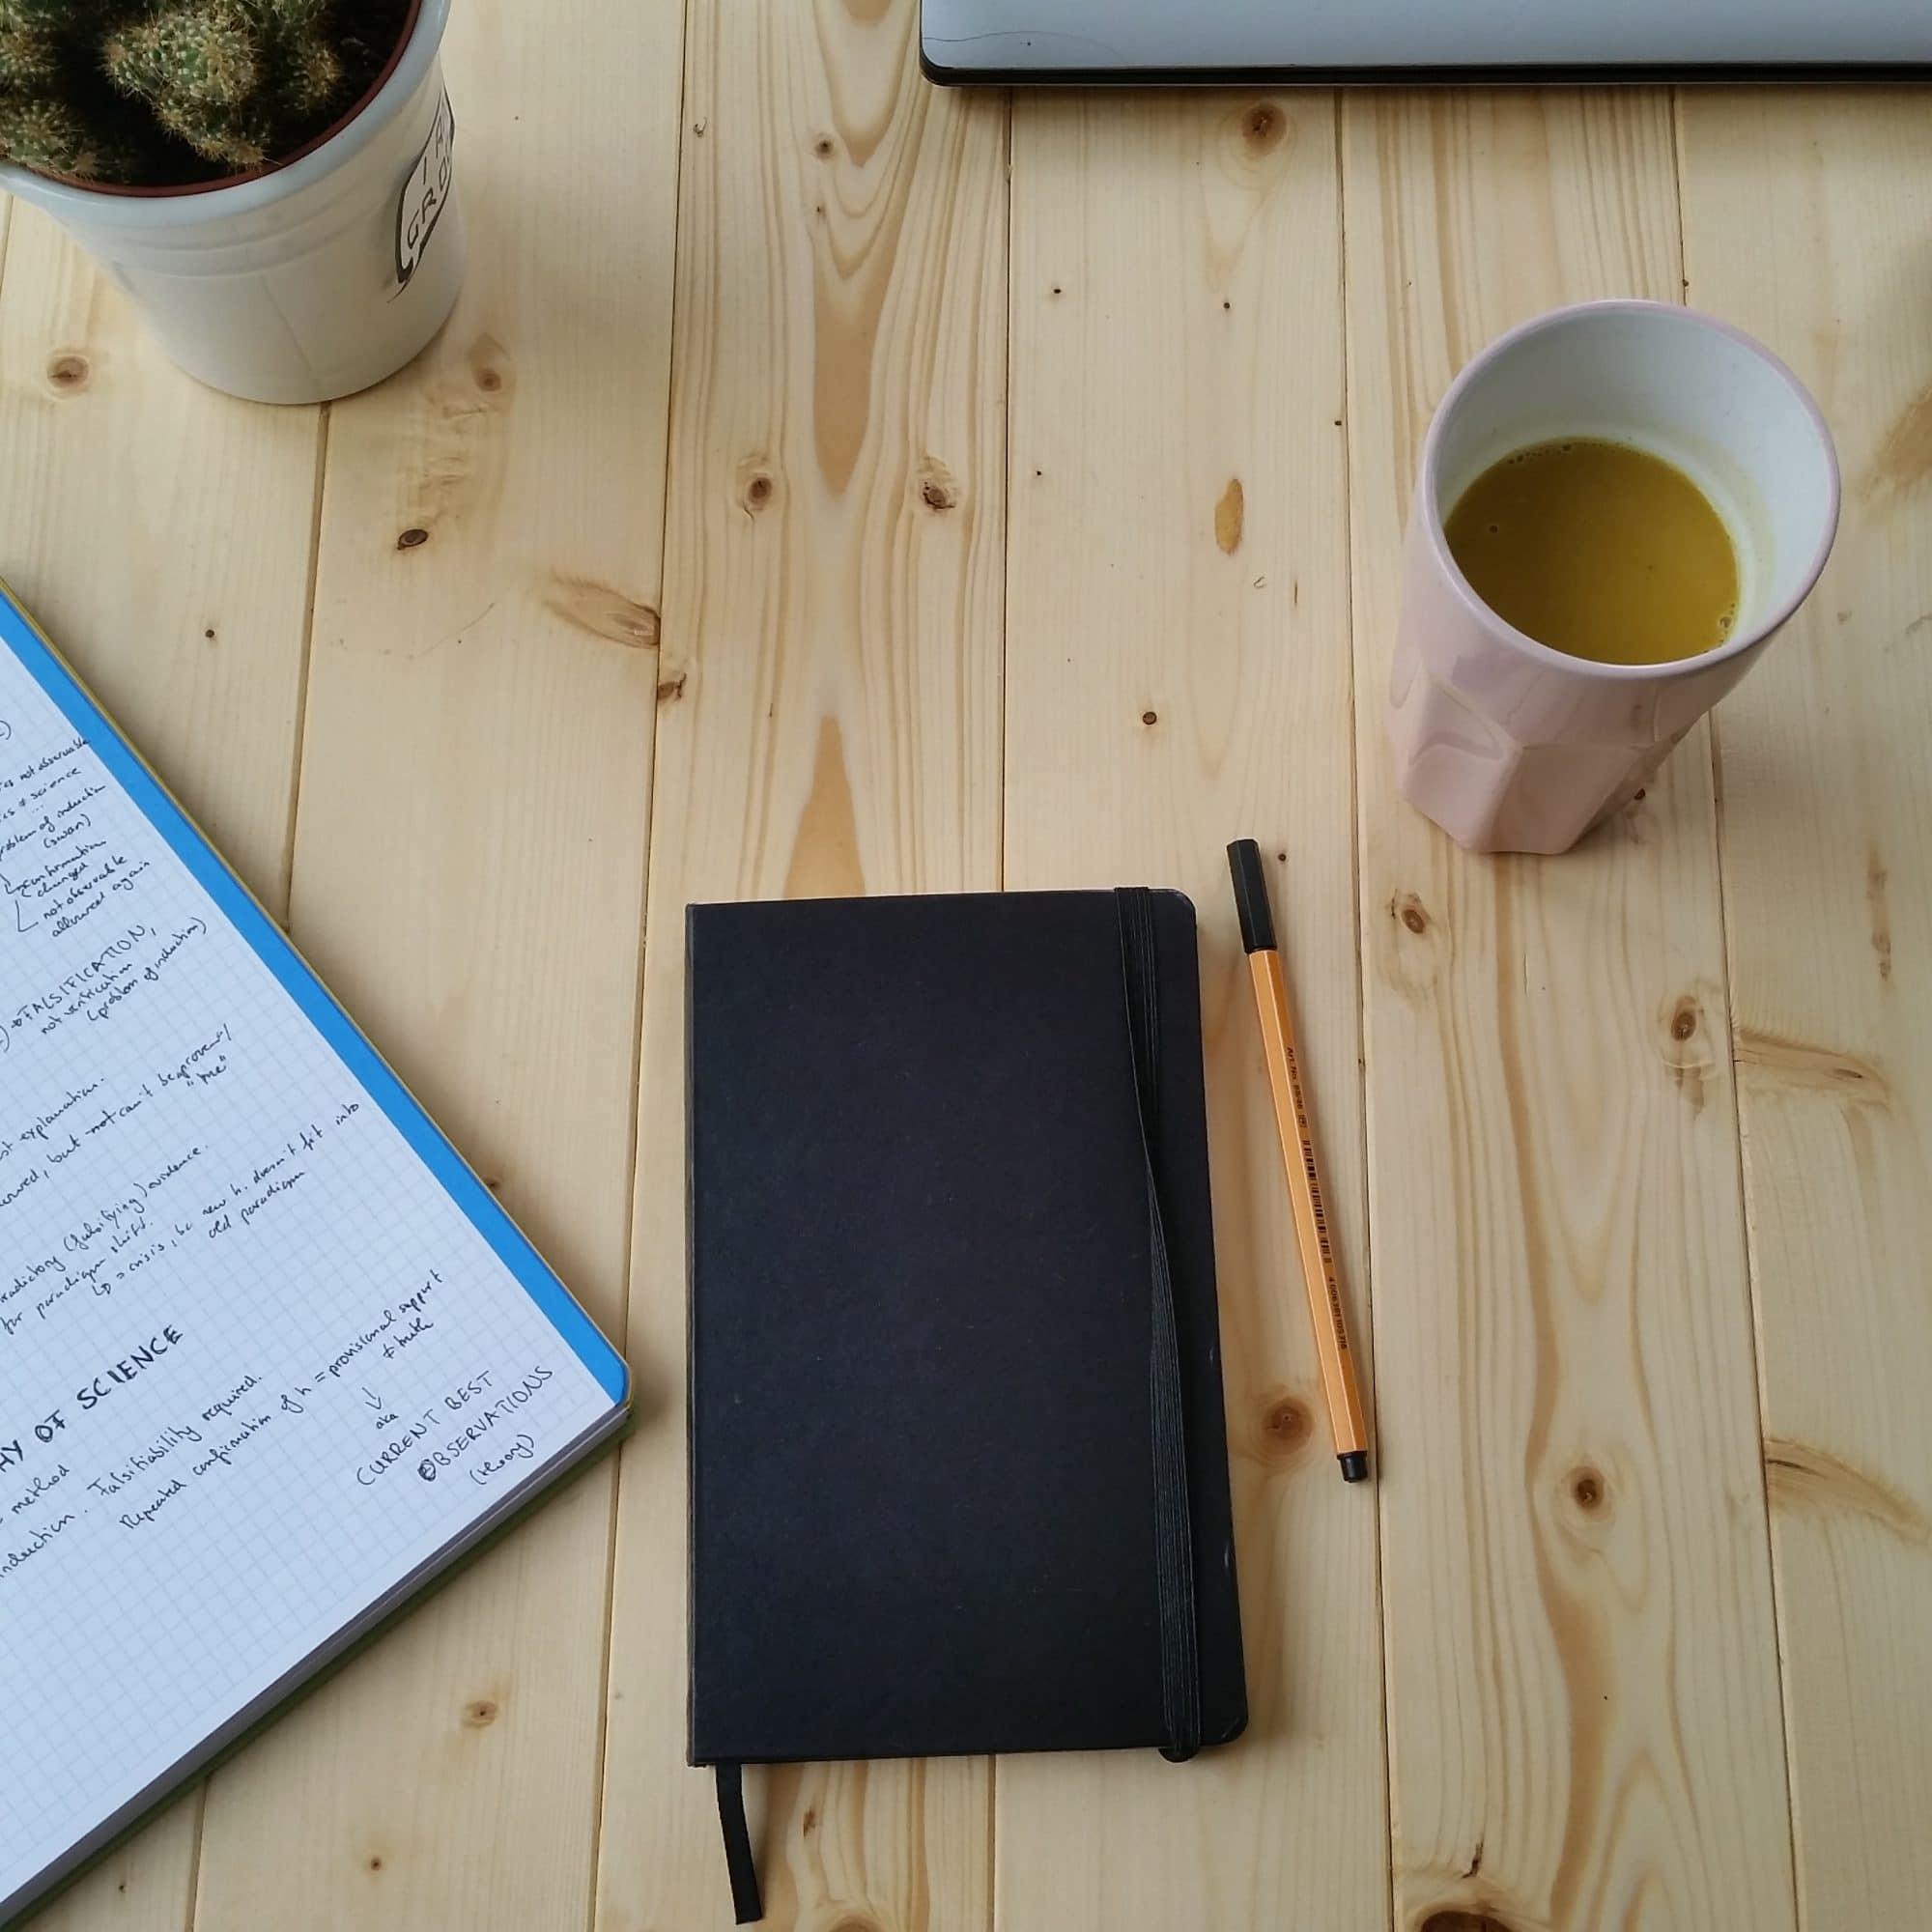 wooden desk flatlay notebook coffee mug pen. Stop procrastinating